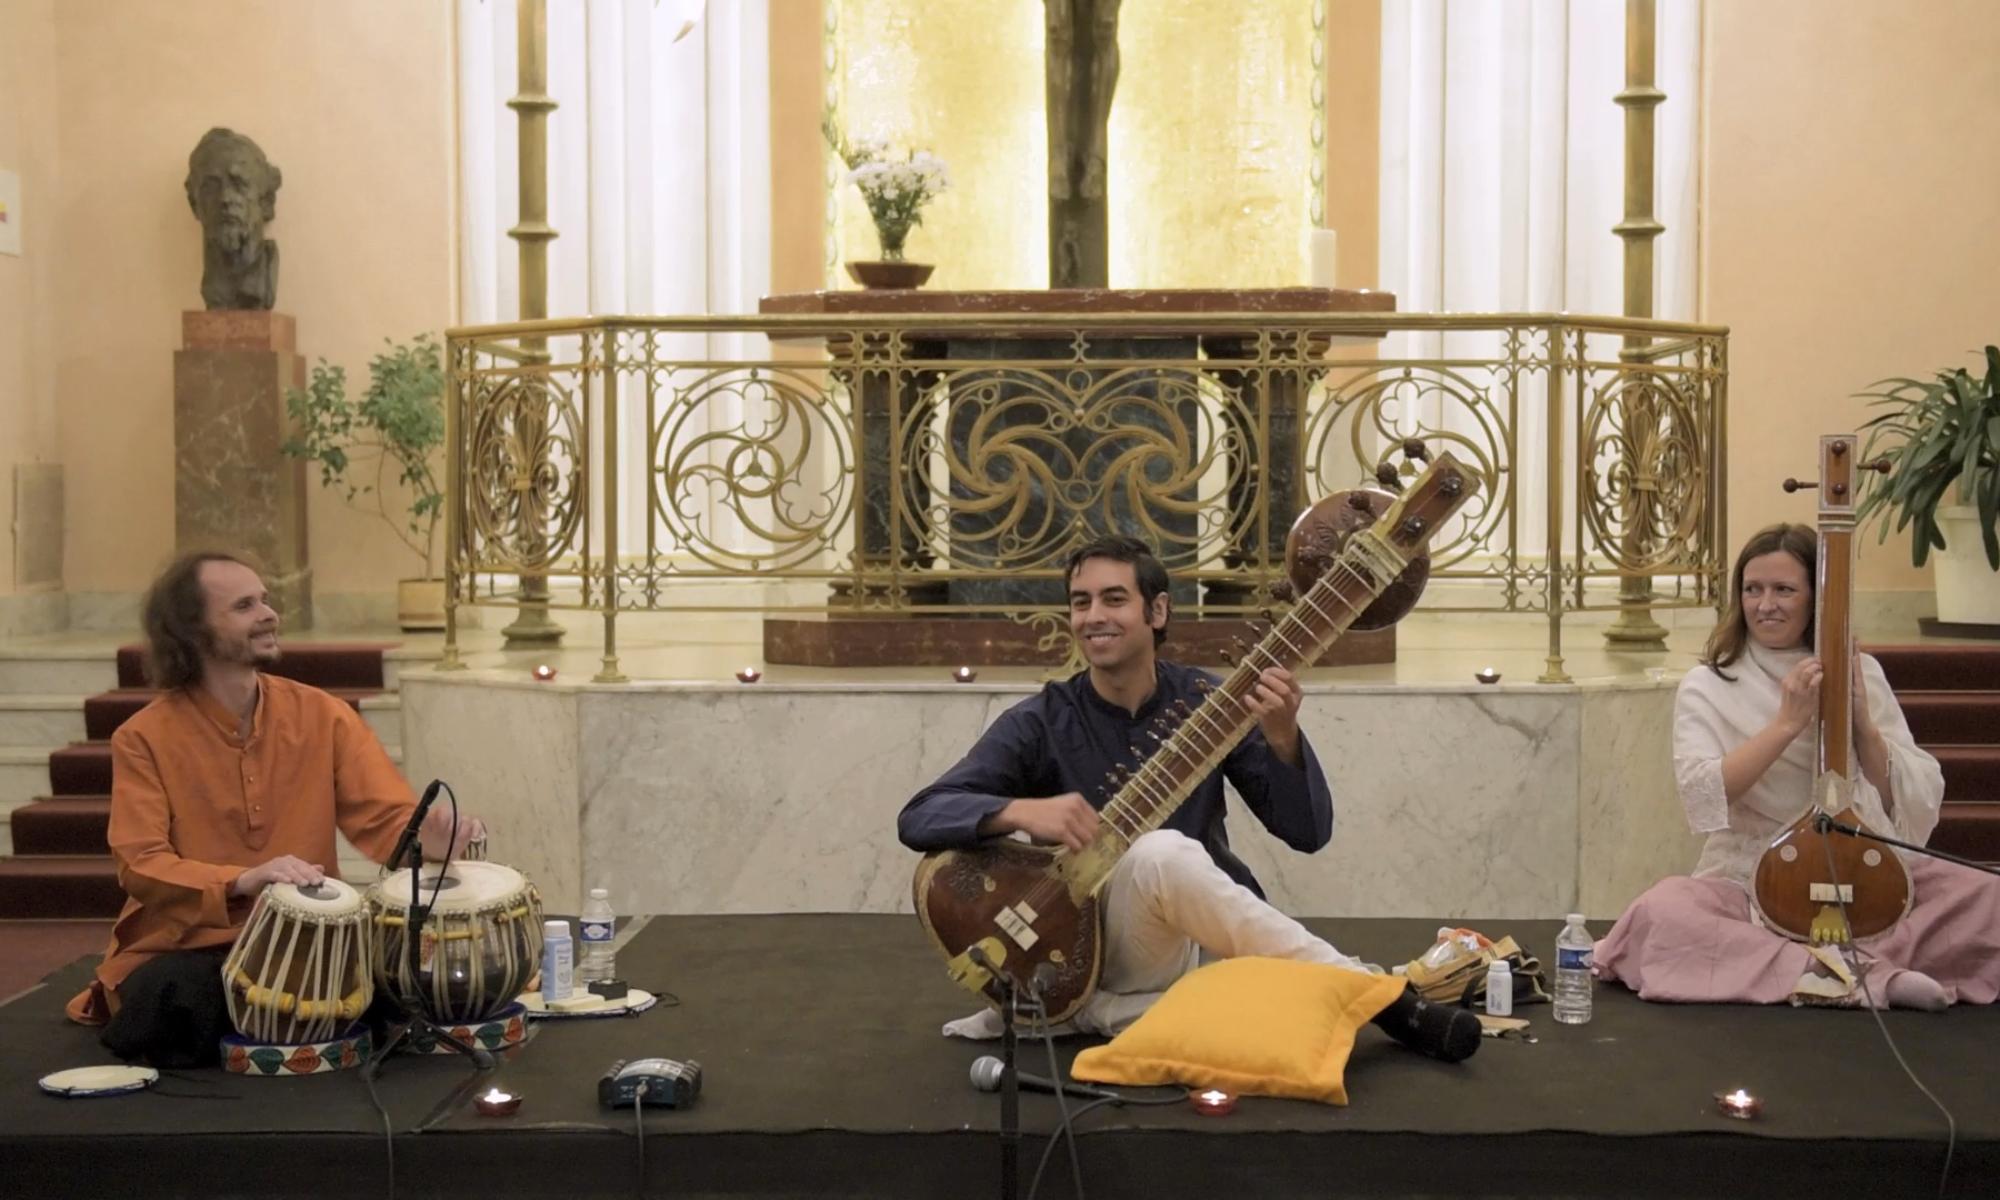 Prague concert of Arjun Verma